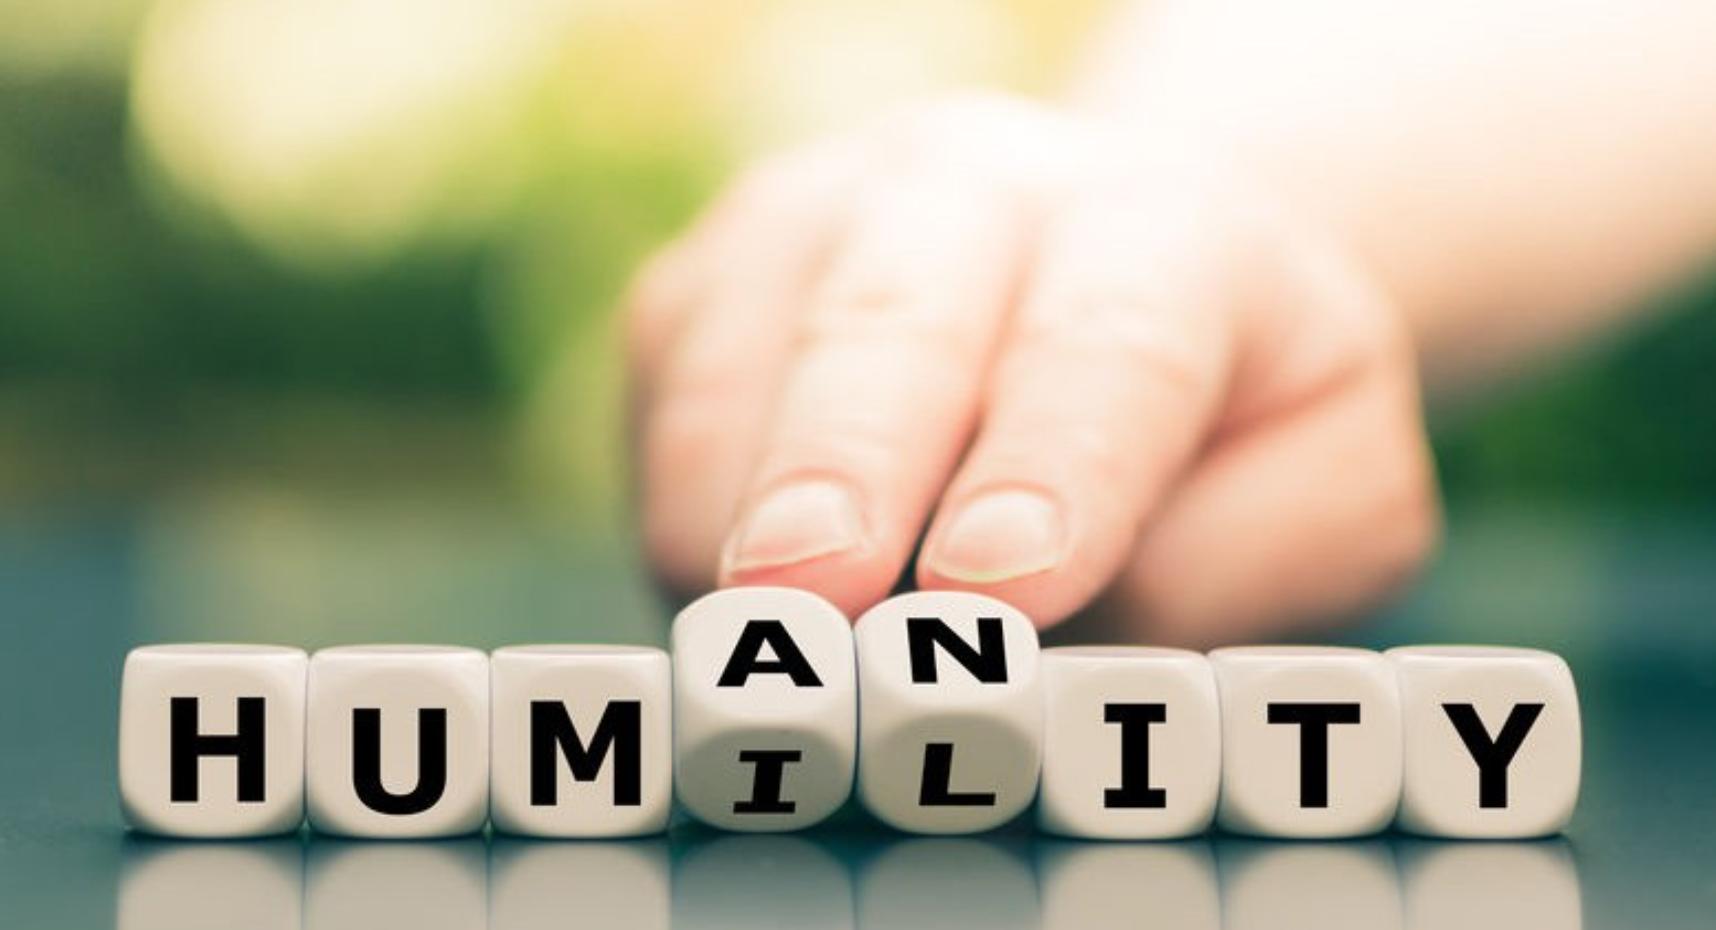 humanity humility